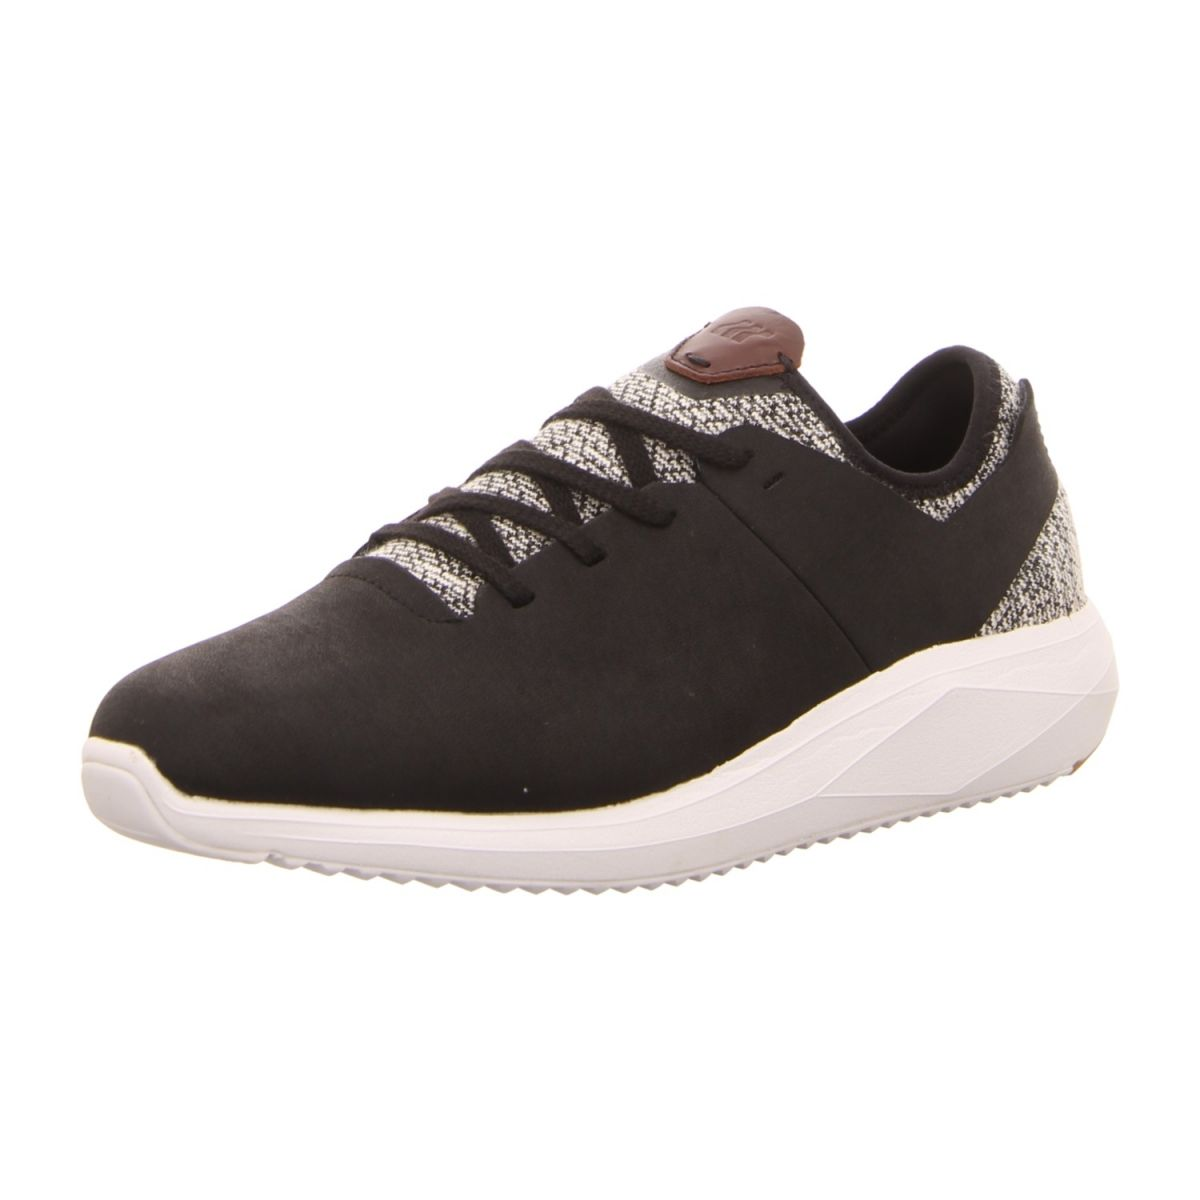 wholesale dealer 136d5 6fd79 NEU: Boxfresh Sneaker Ceza - E-14758 - blk -   Schuhe ...